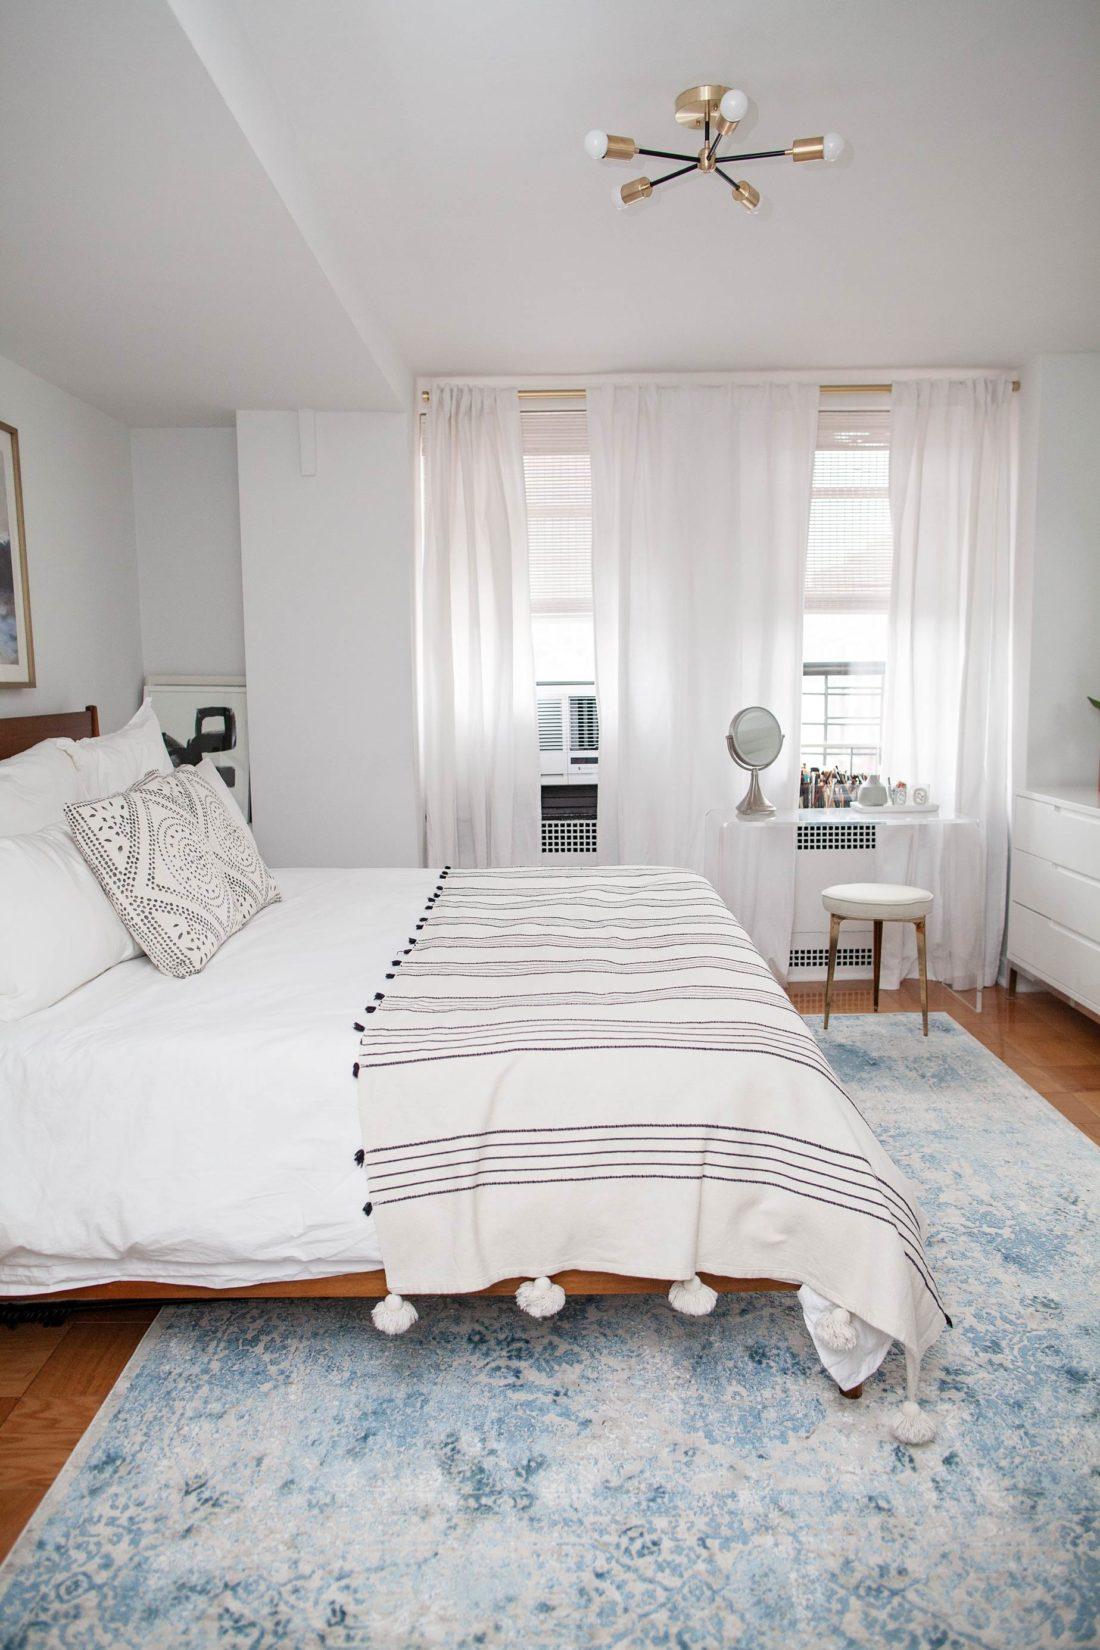 February Bedroom Home Decor Rug Pillows Throws West Elm Cb2 4